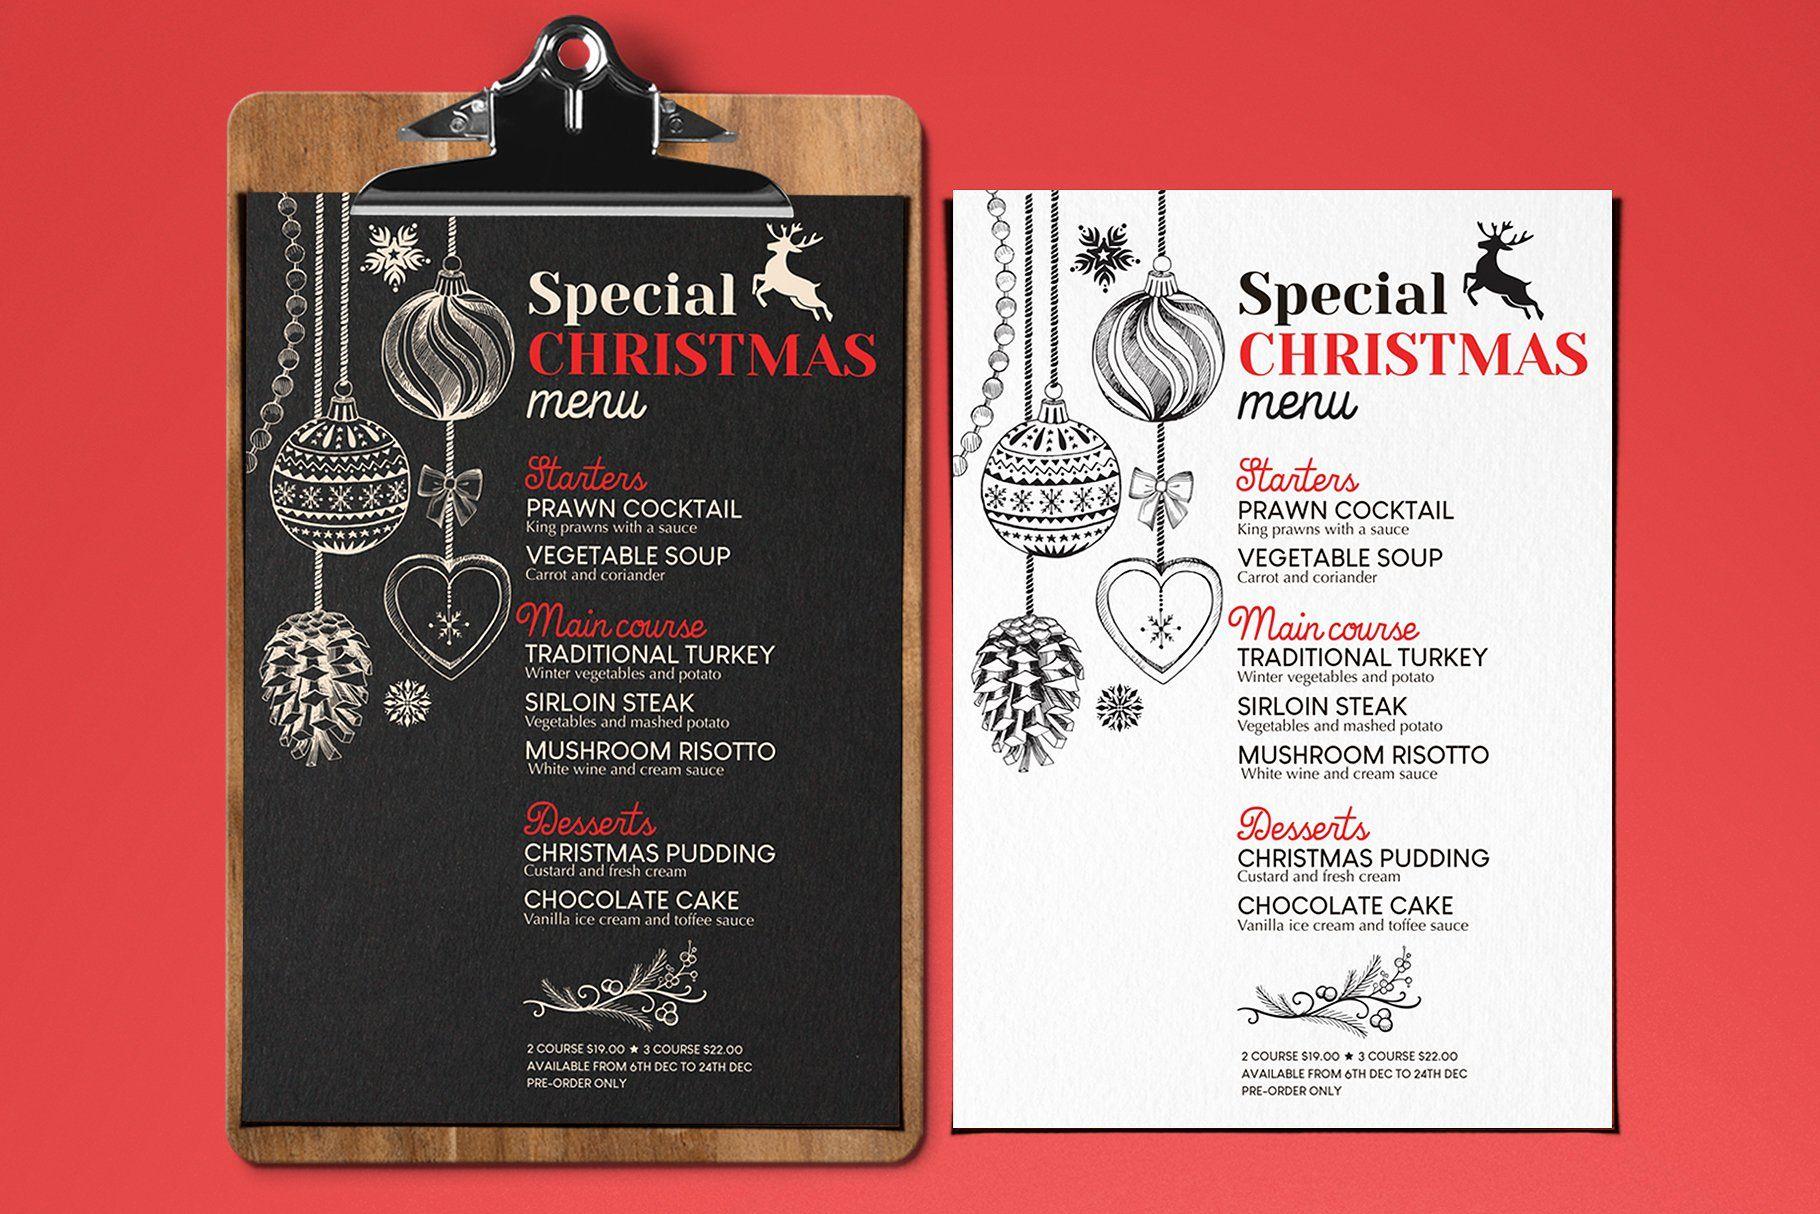 Christmas Dinner Restaurant Menu Inches Free Texts Fonts Christmas Party Menu Dinner Restaurants Menu Restaurant